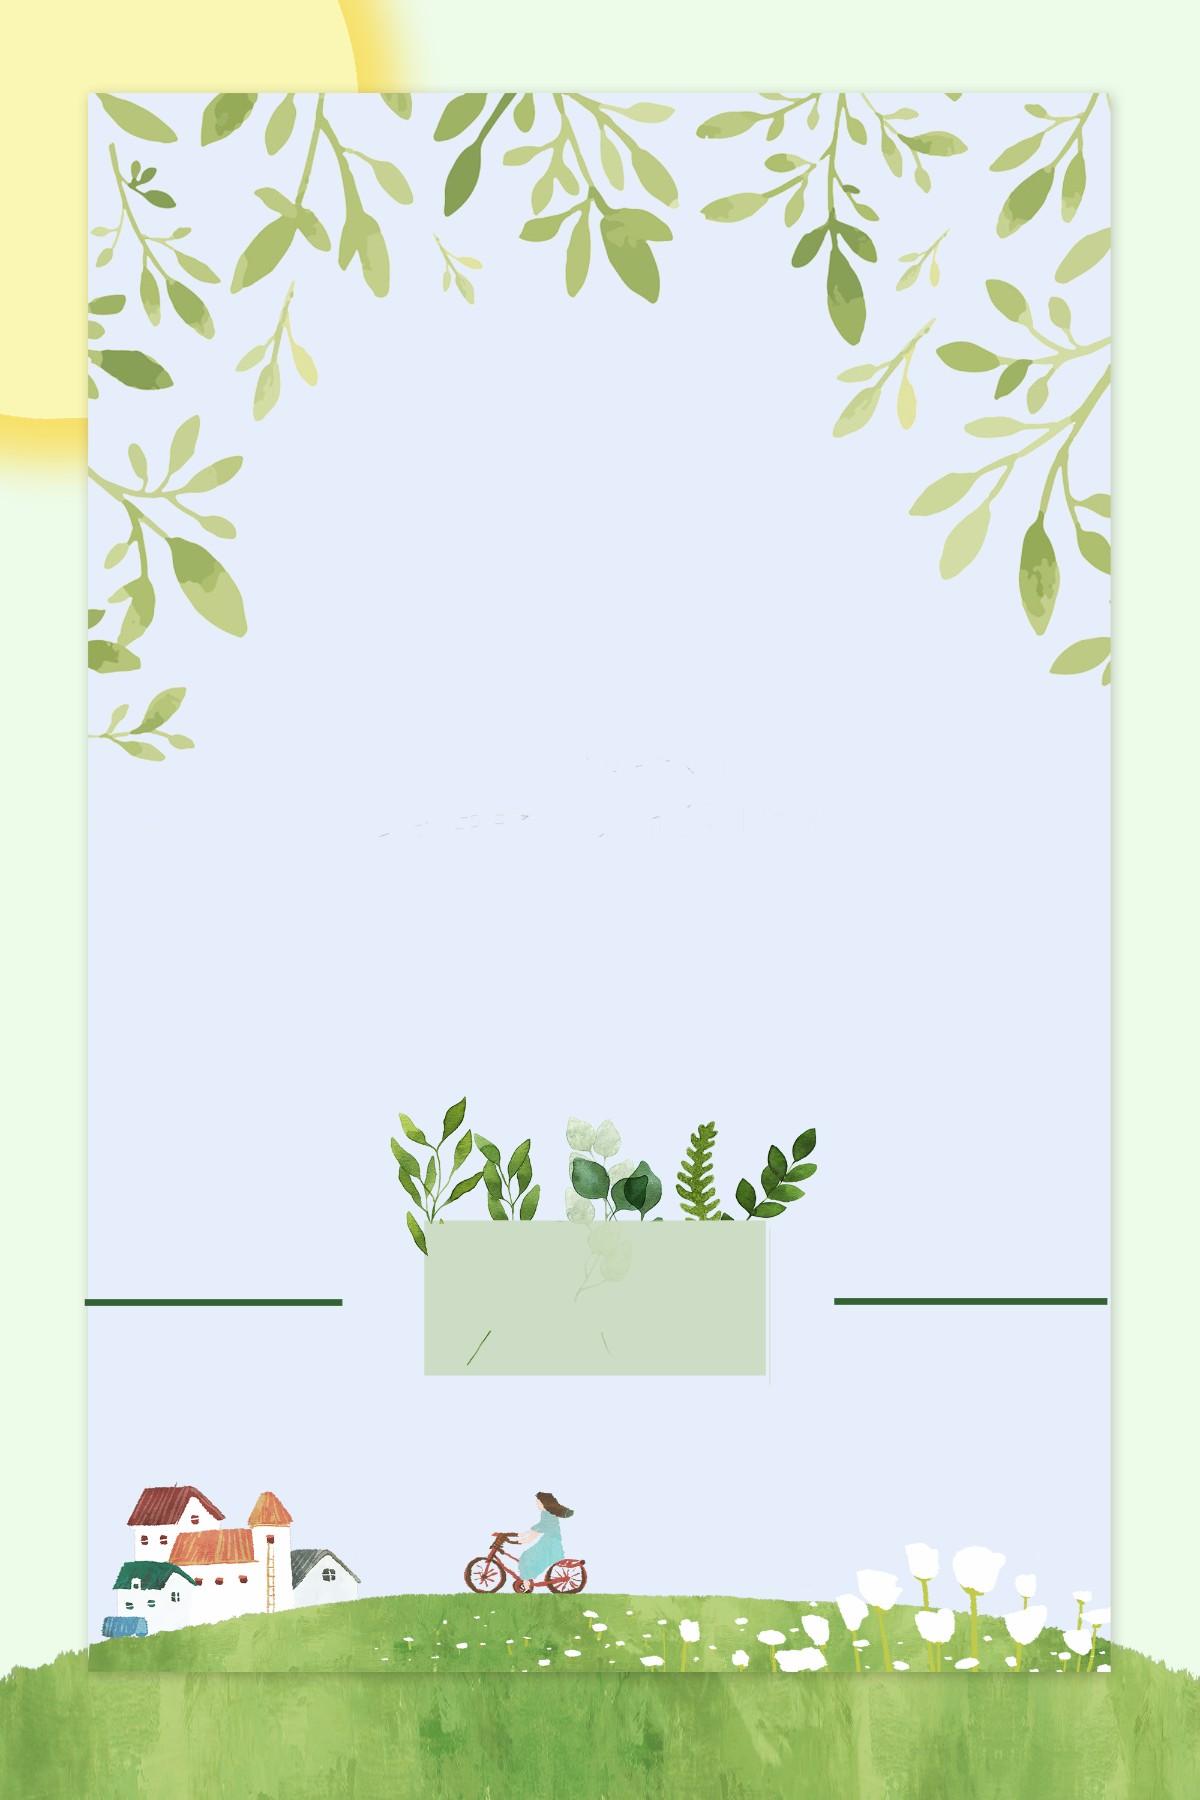 ppt 背景 背景图片 边框 模板 设计 矢量 矢量图 素材 相框 1200_1800